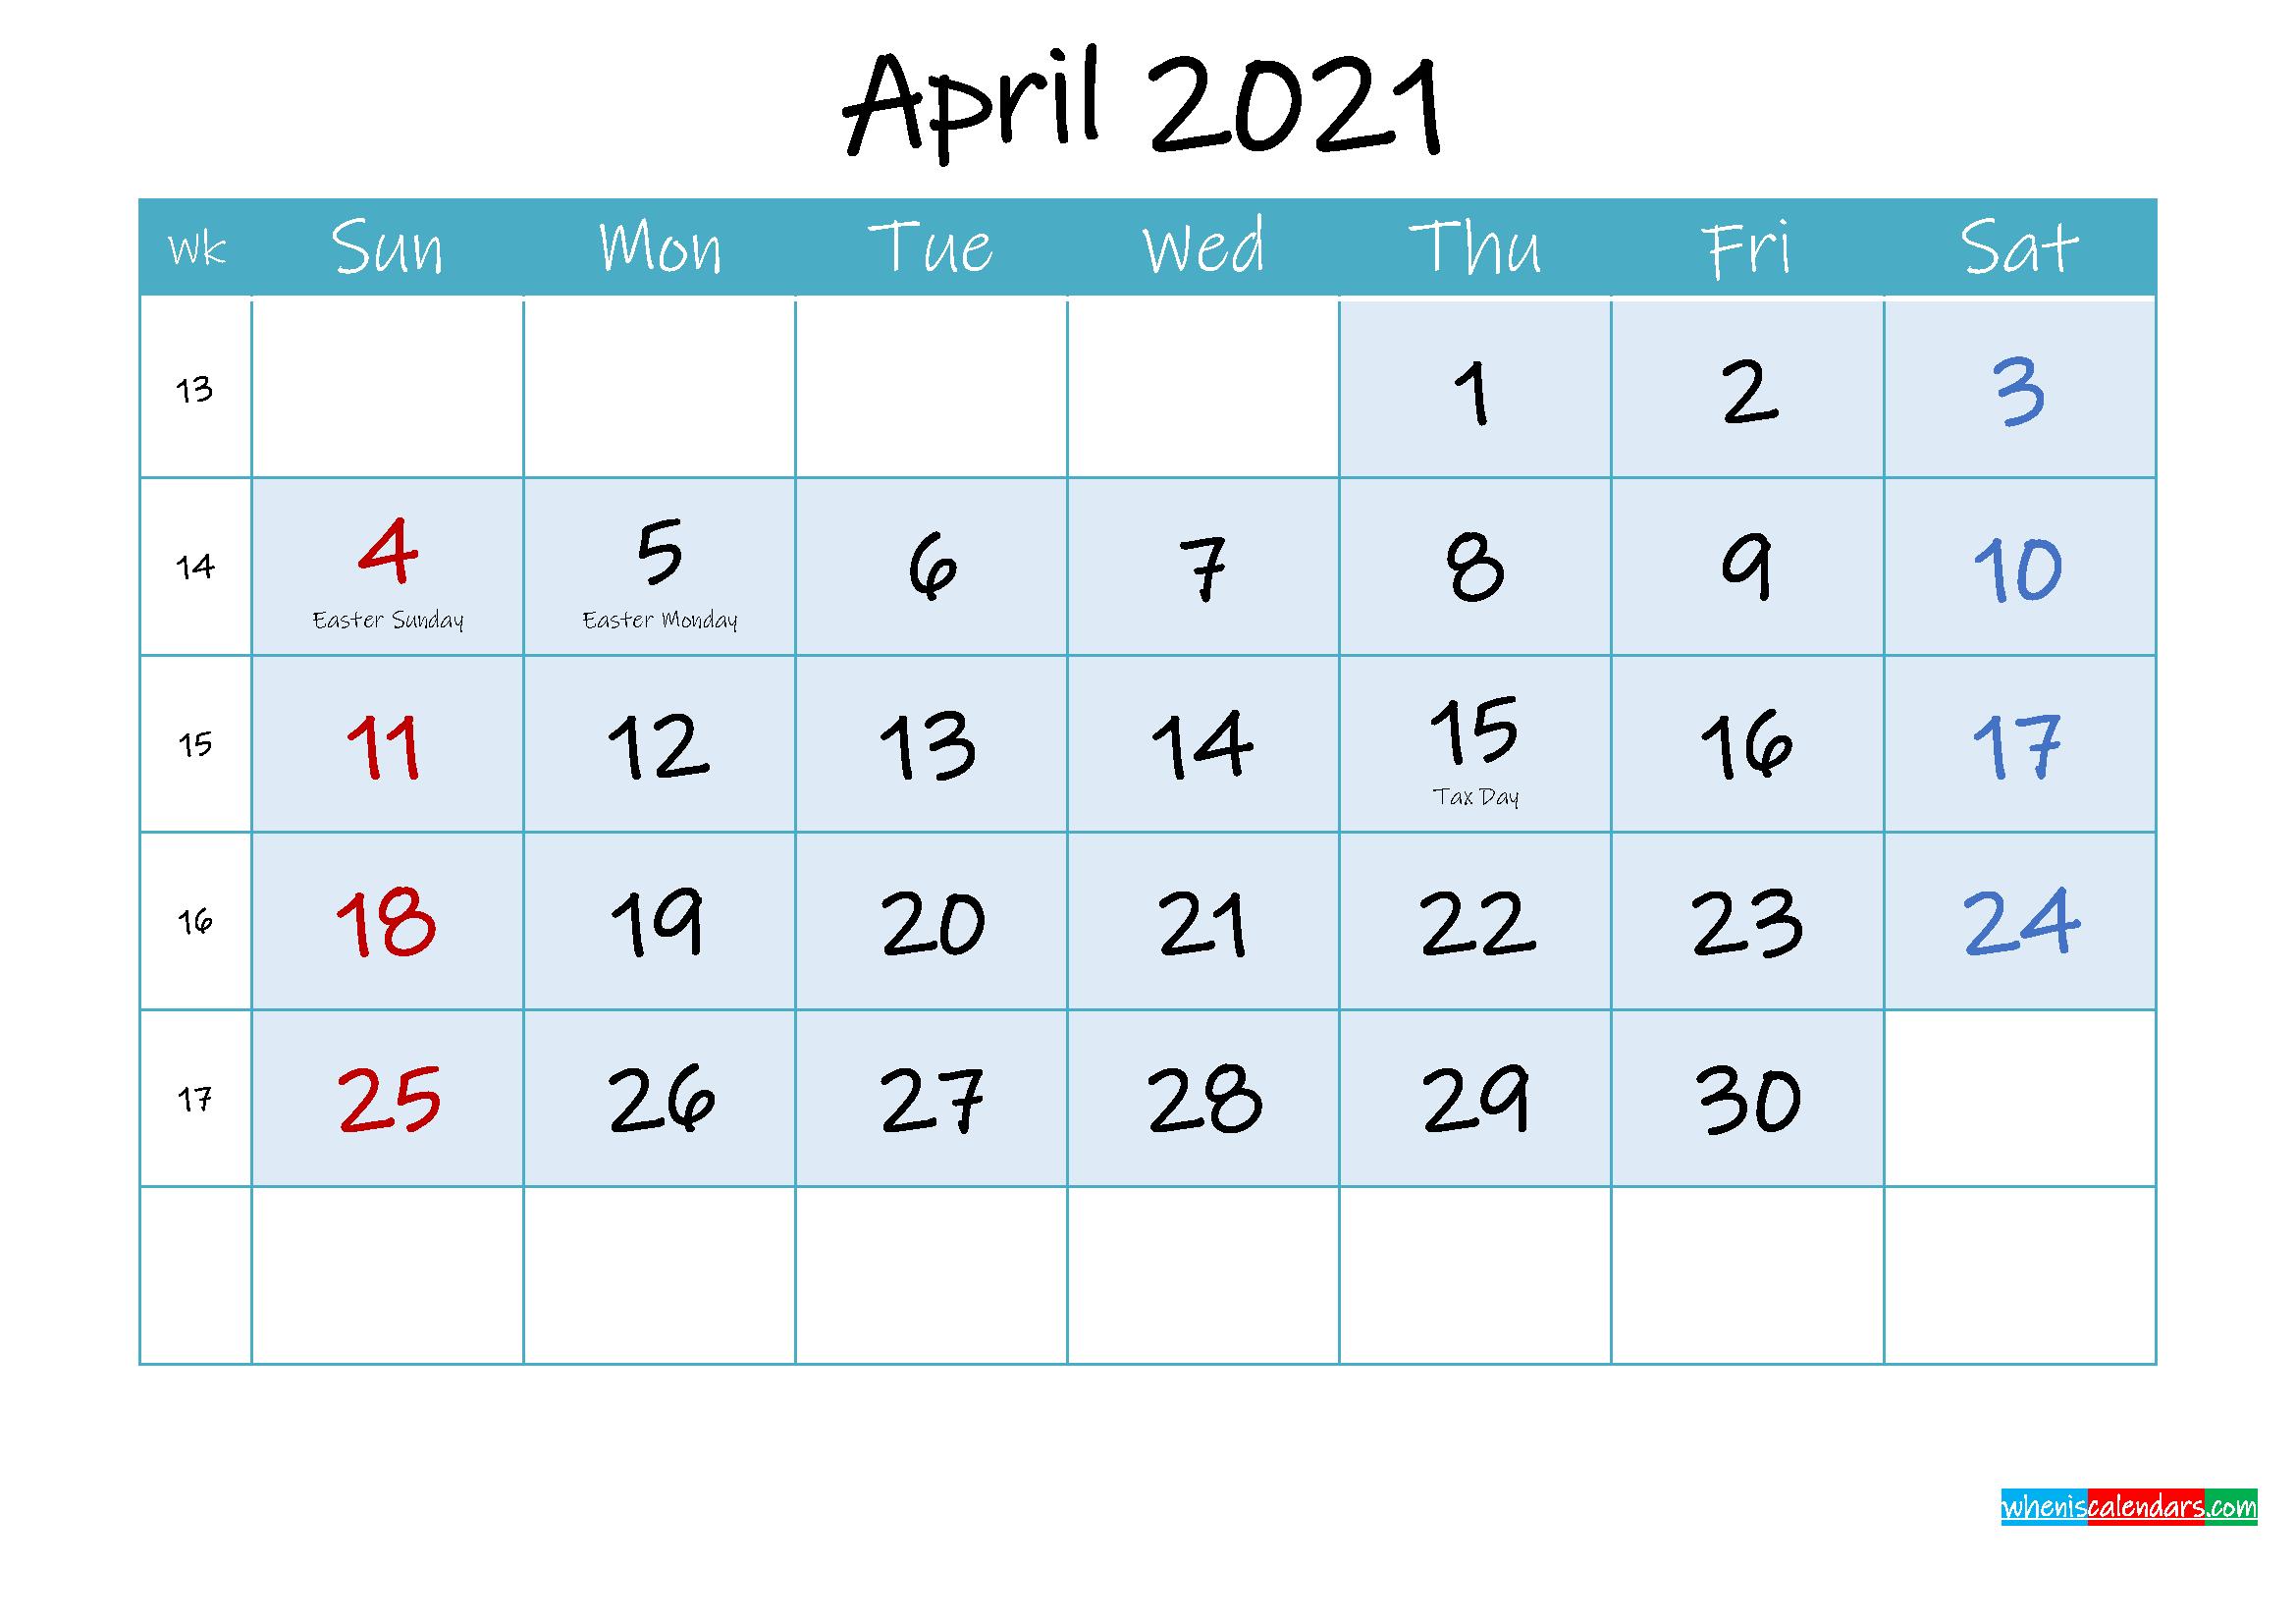 April 2021 Free Printable Calendar With Holidays